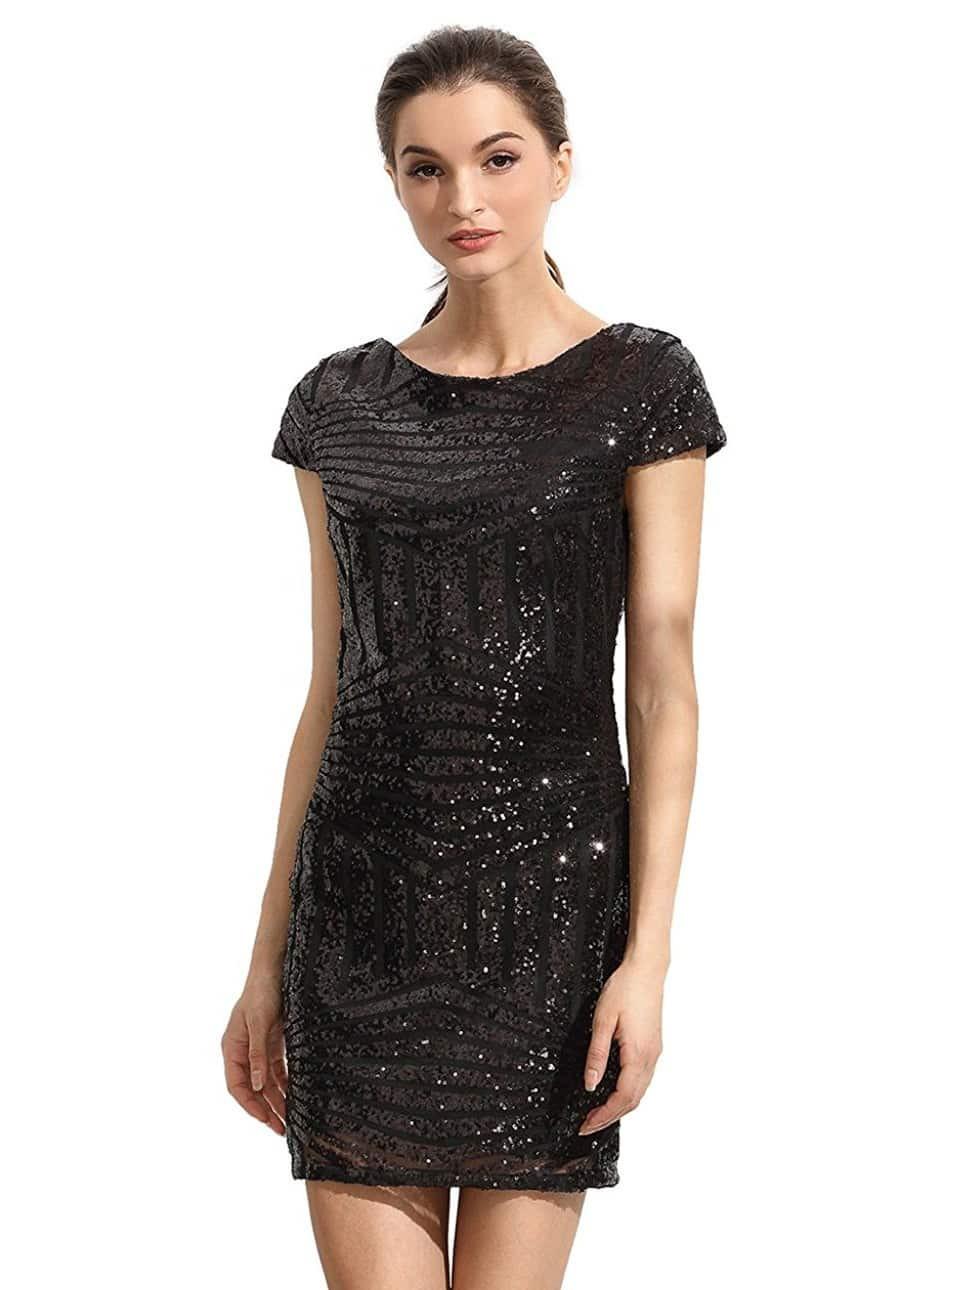 Black Sleeve sequin dress new photo